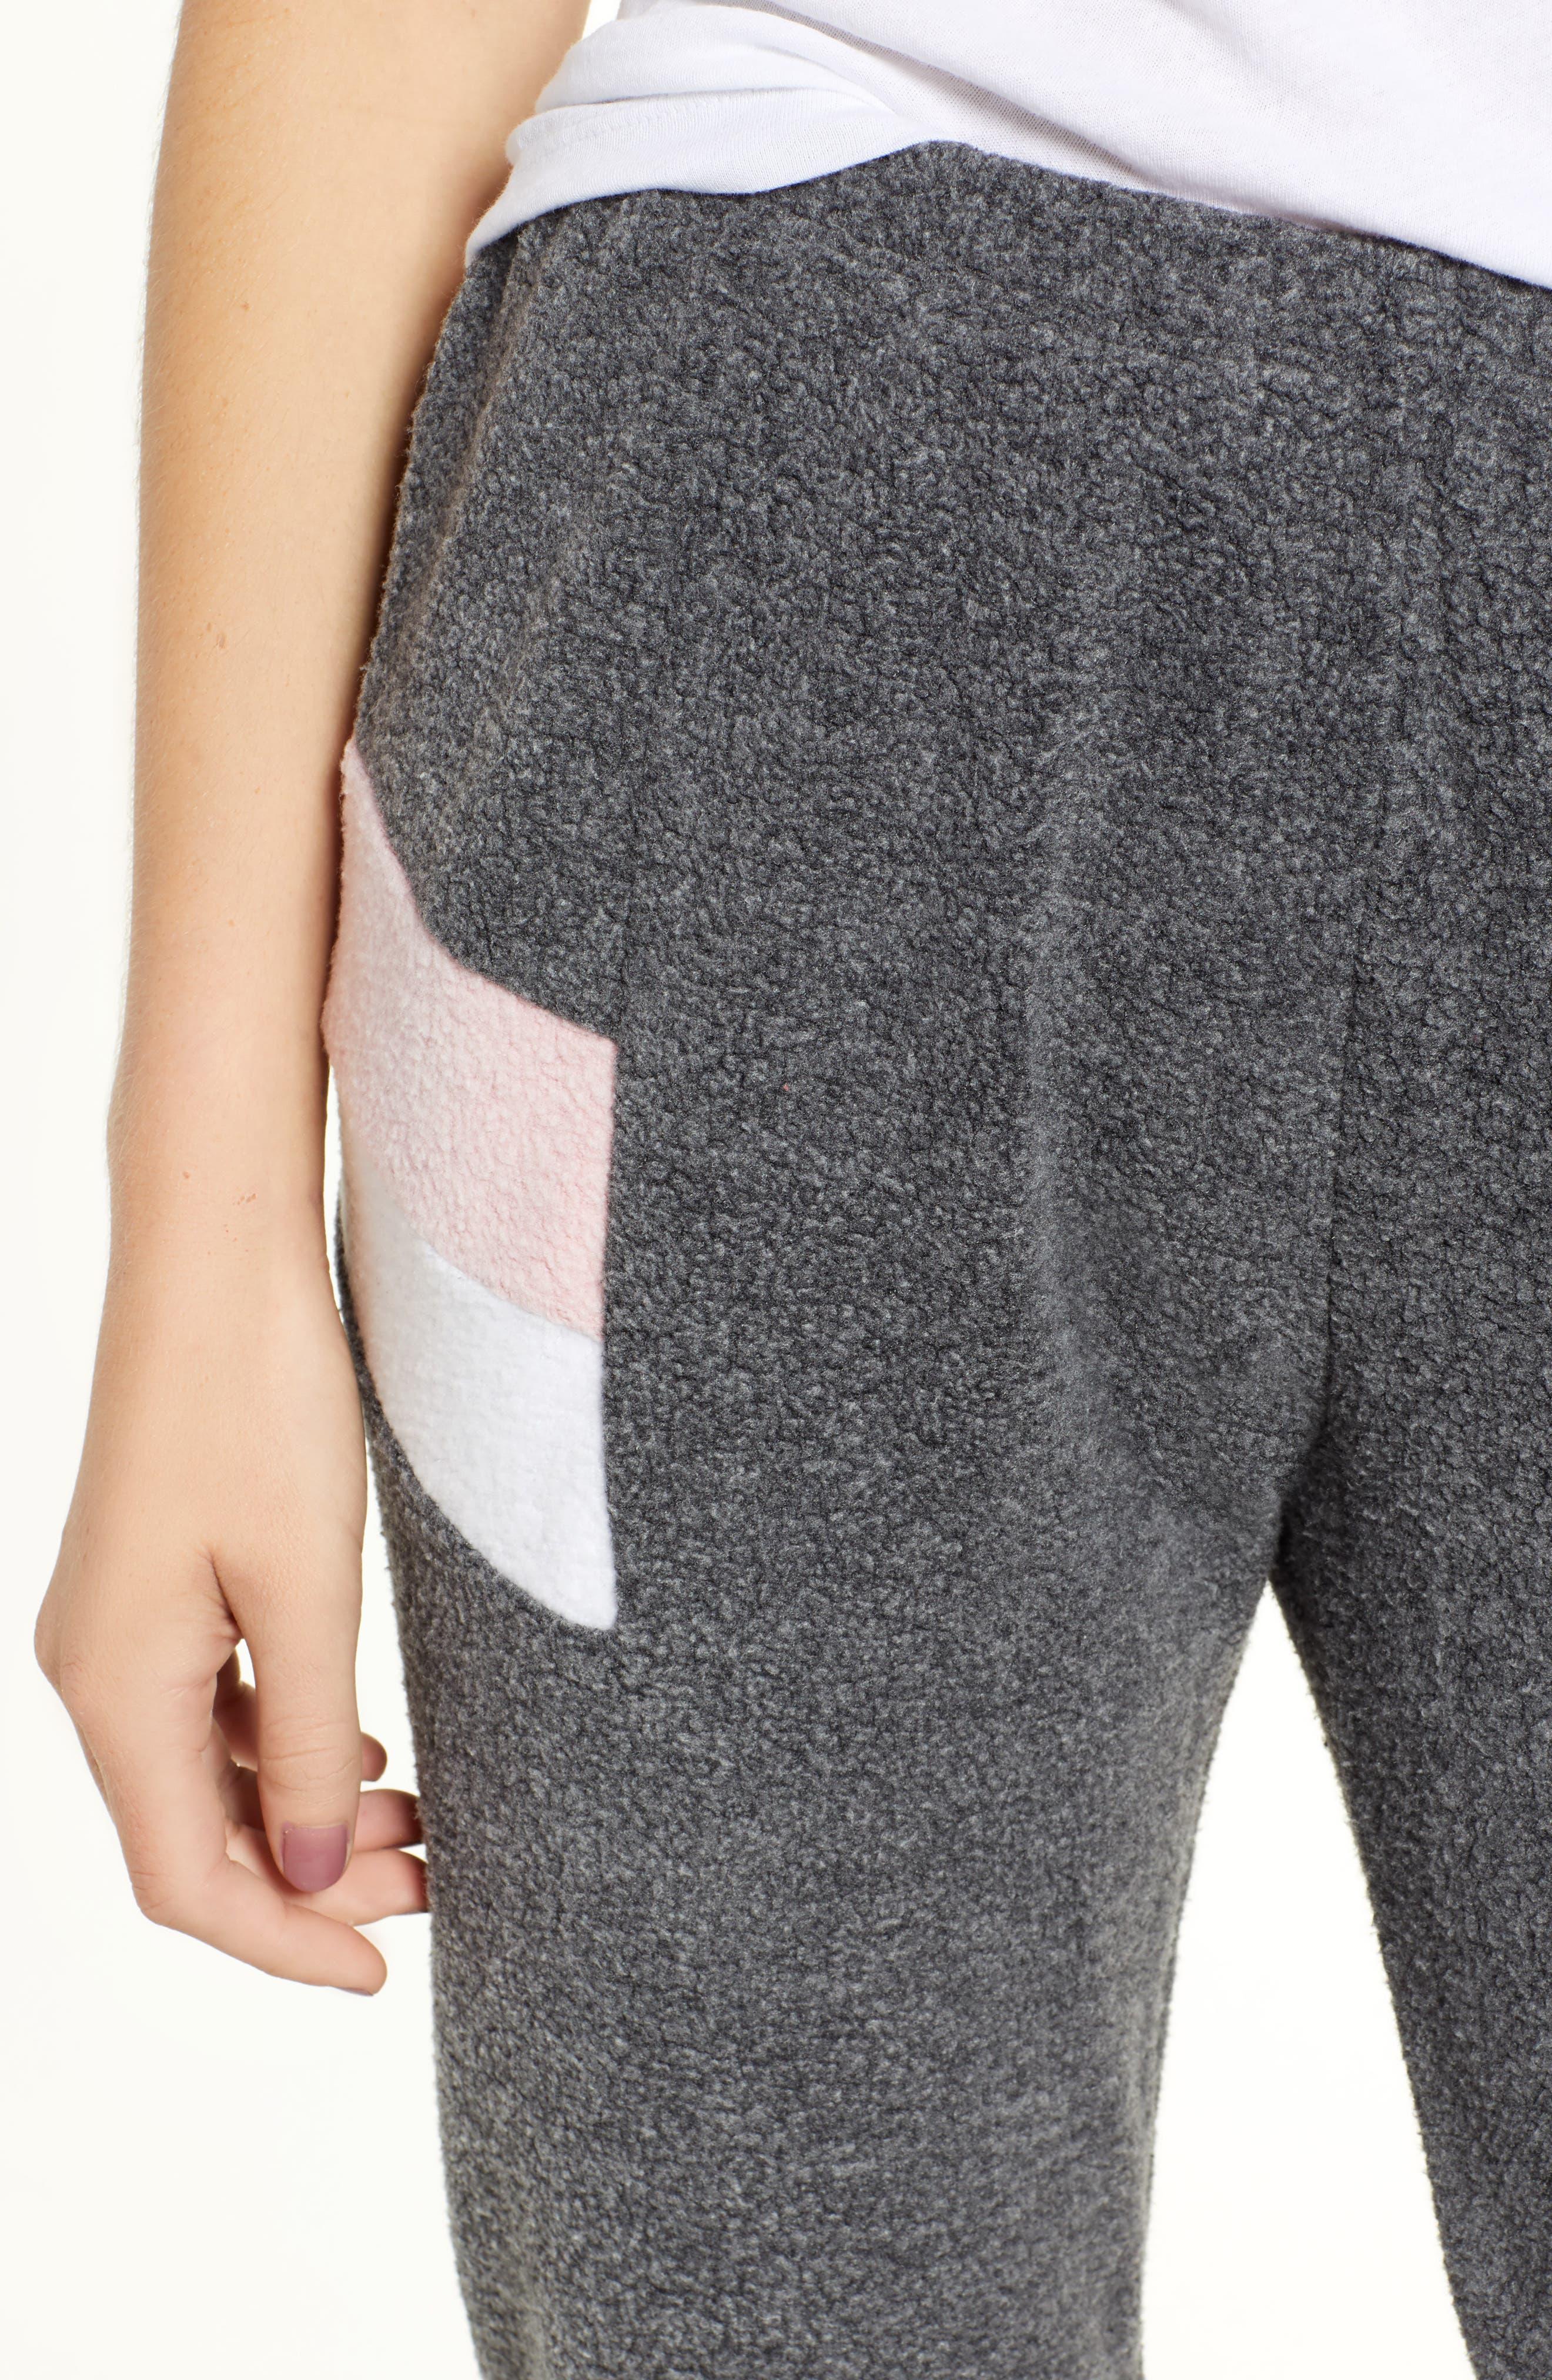 Knox Sweatpants,                             Alternate thumbnail 4, color,                             CLEAN BLACK